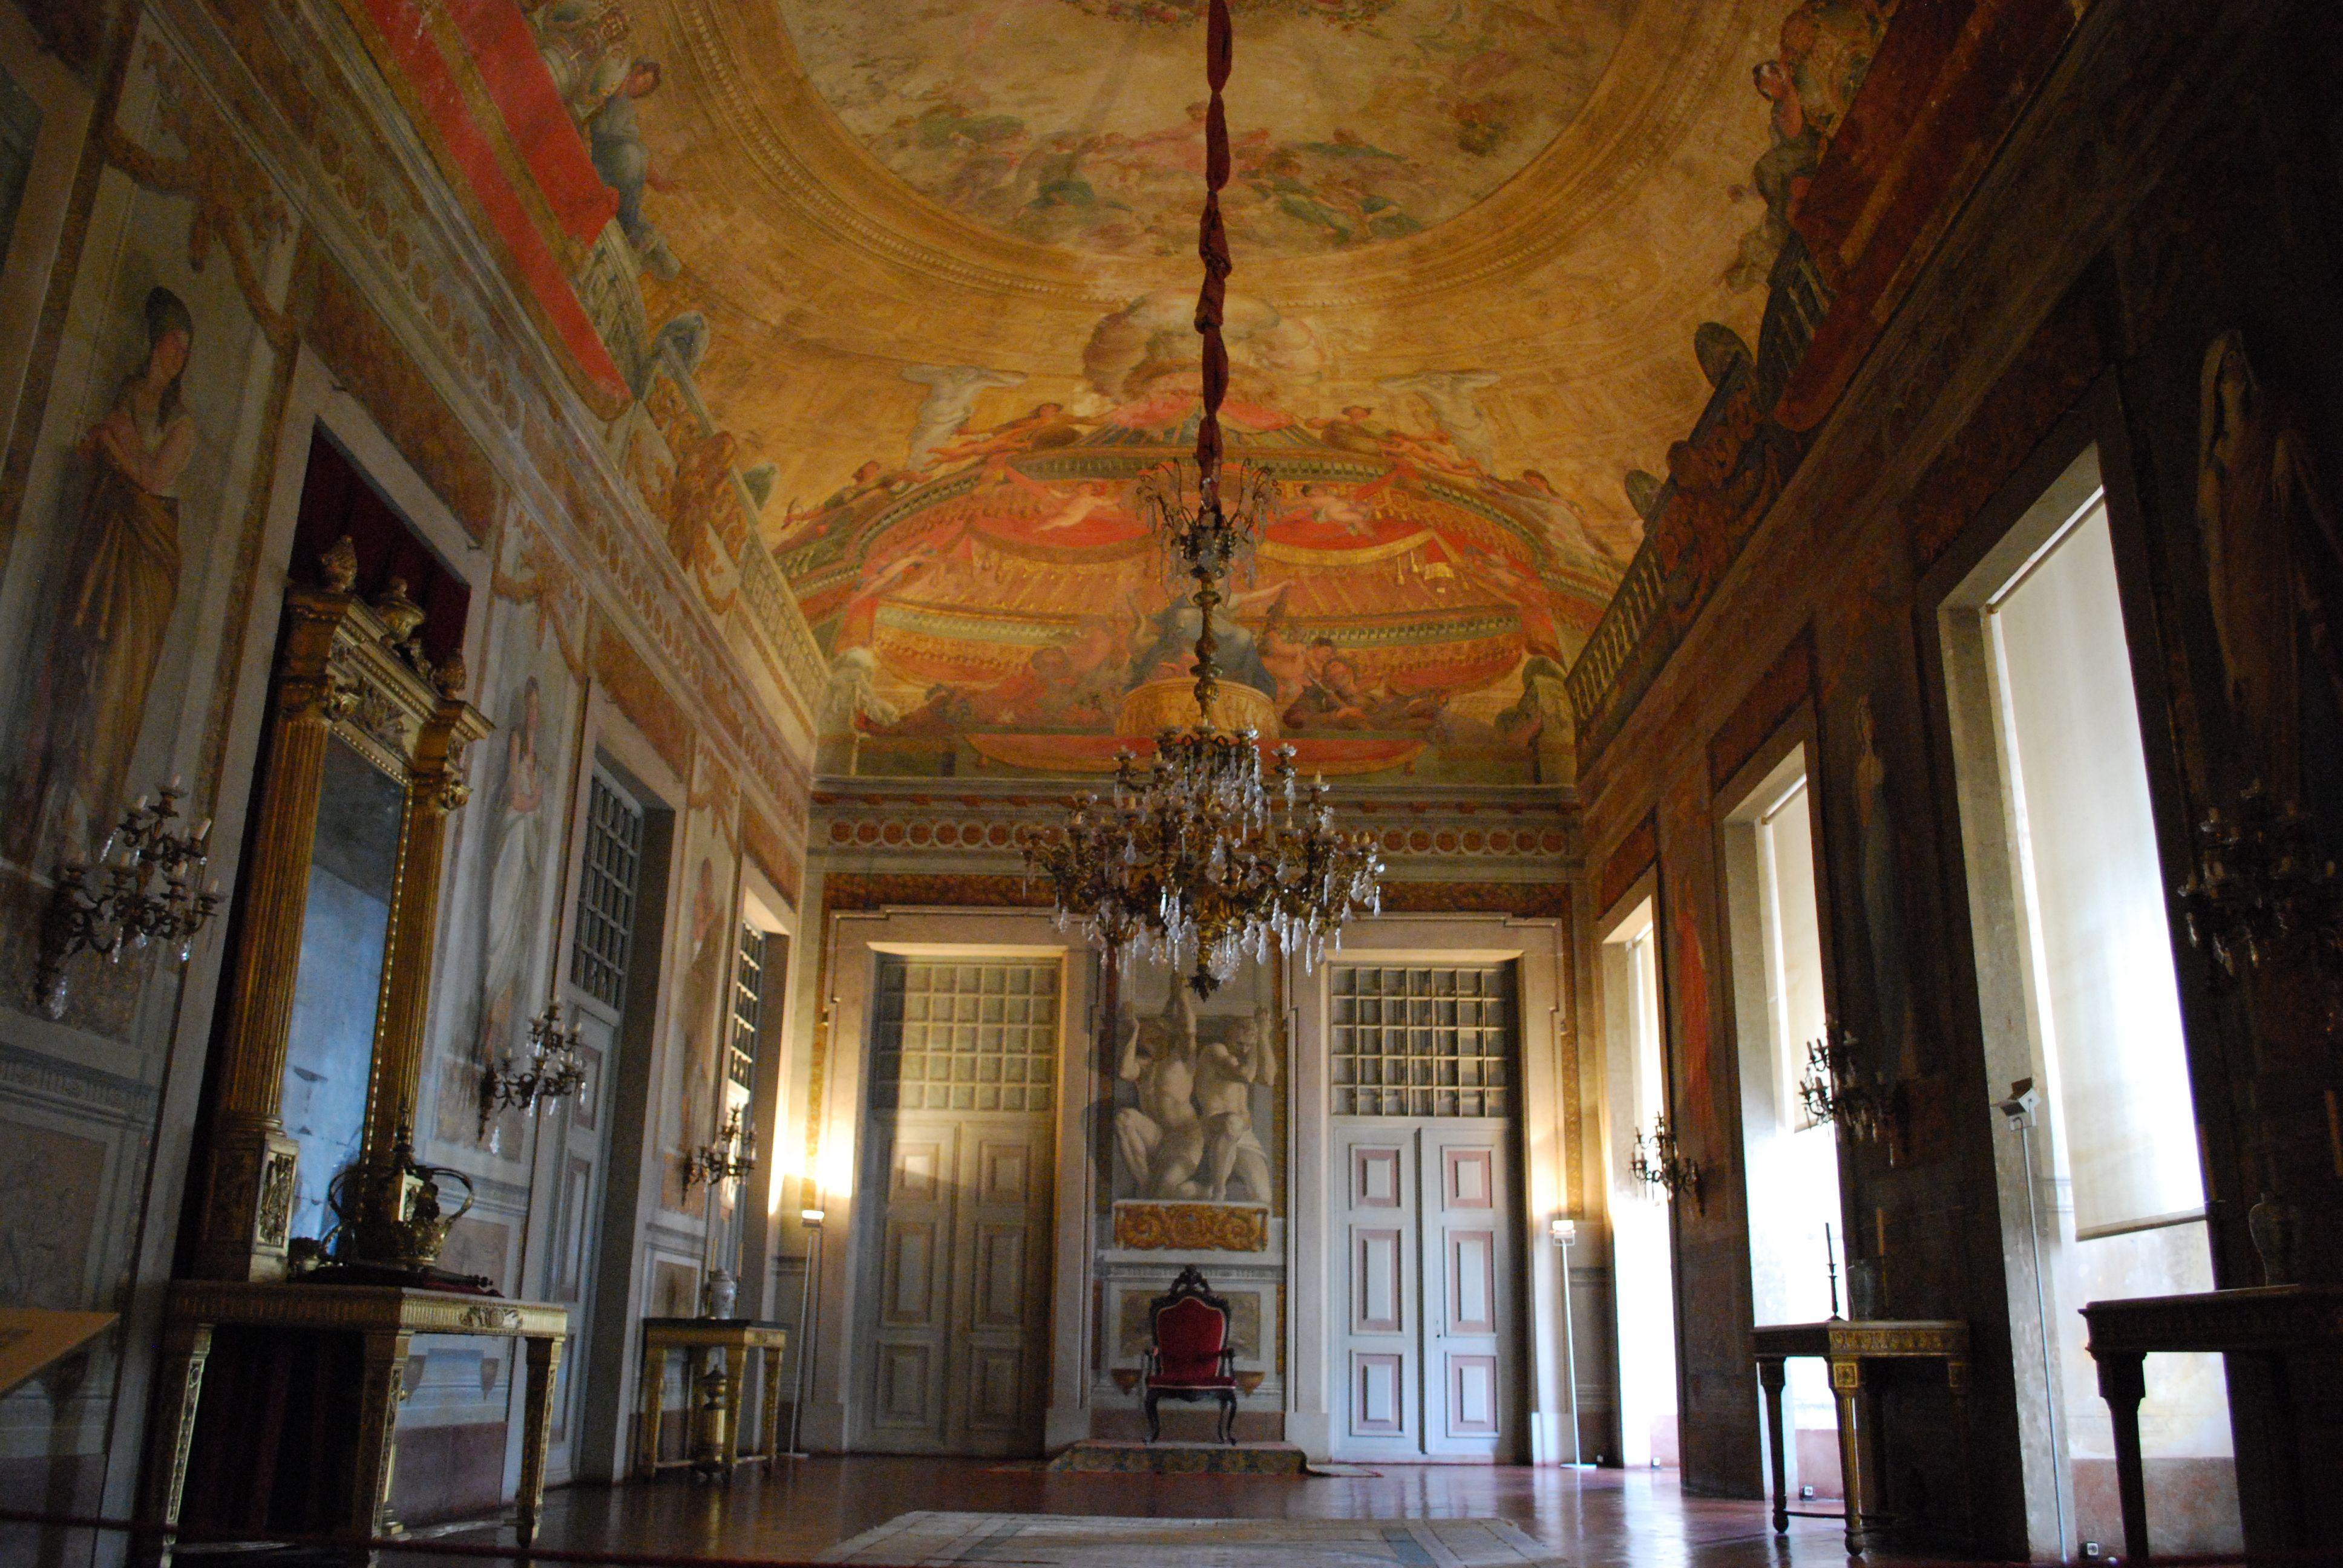 Palacio Nacional De Mafra Mafra National Palace Palacio